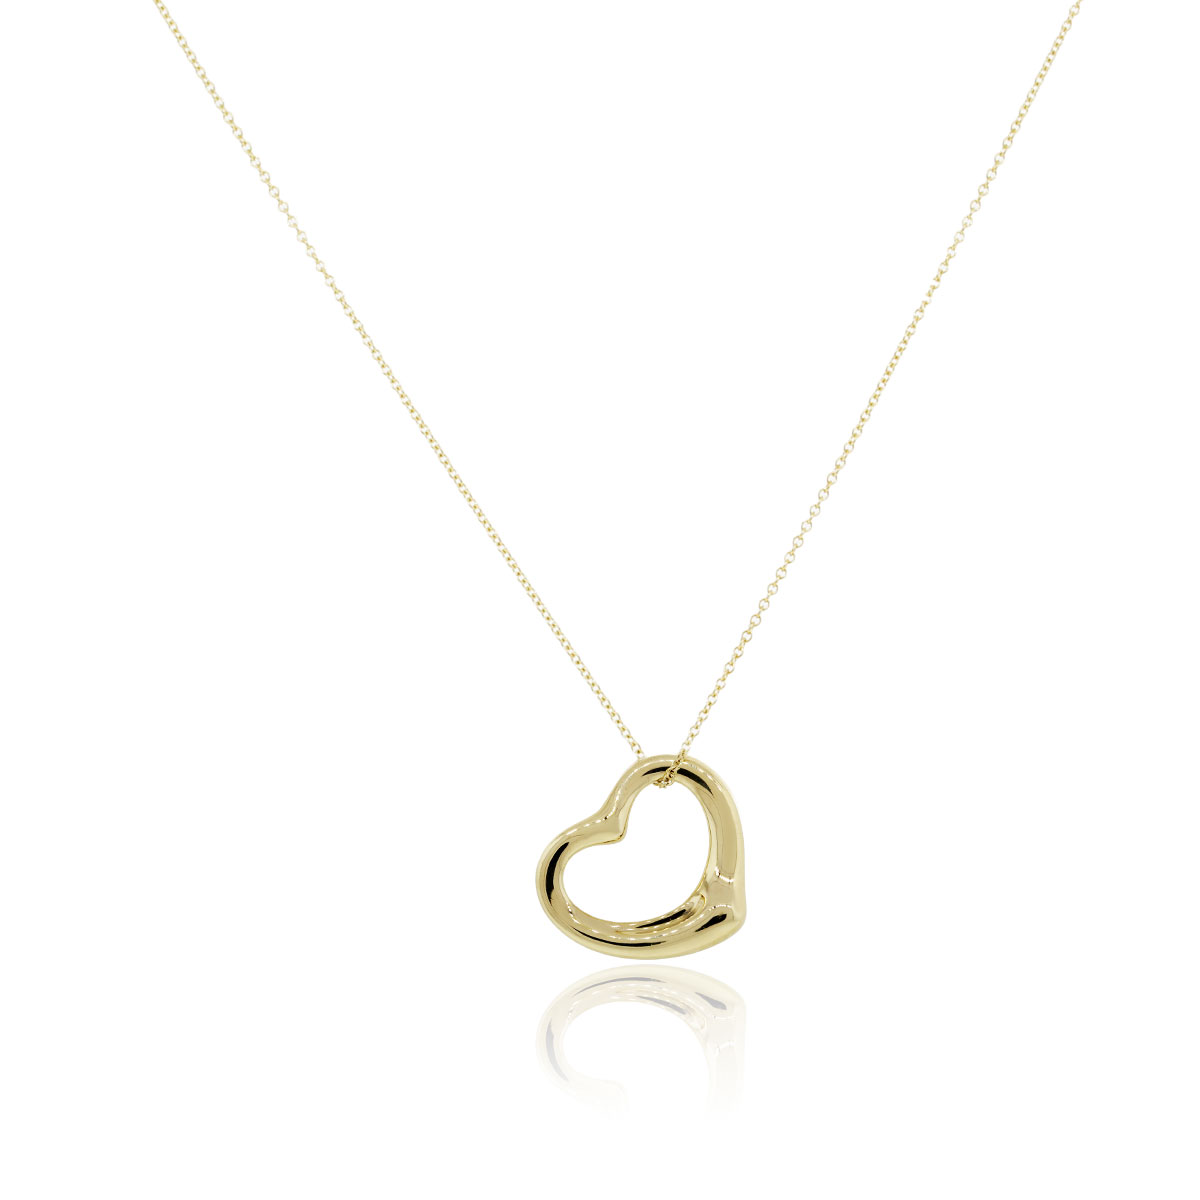 Tiffany Amp Co 18k Yellow Gold Elsa Peretti Open Heart